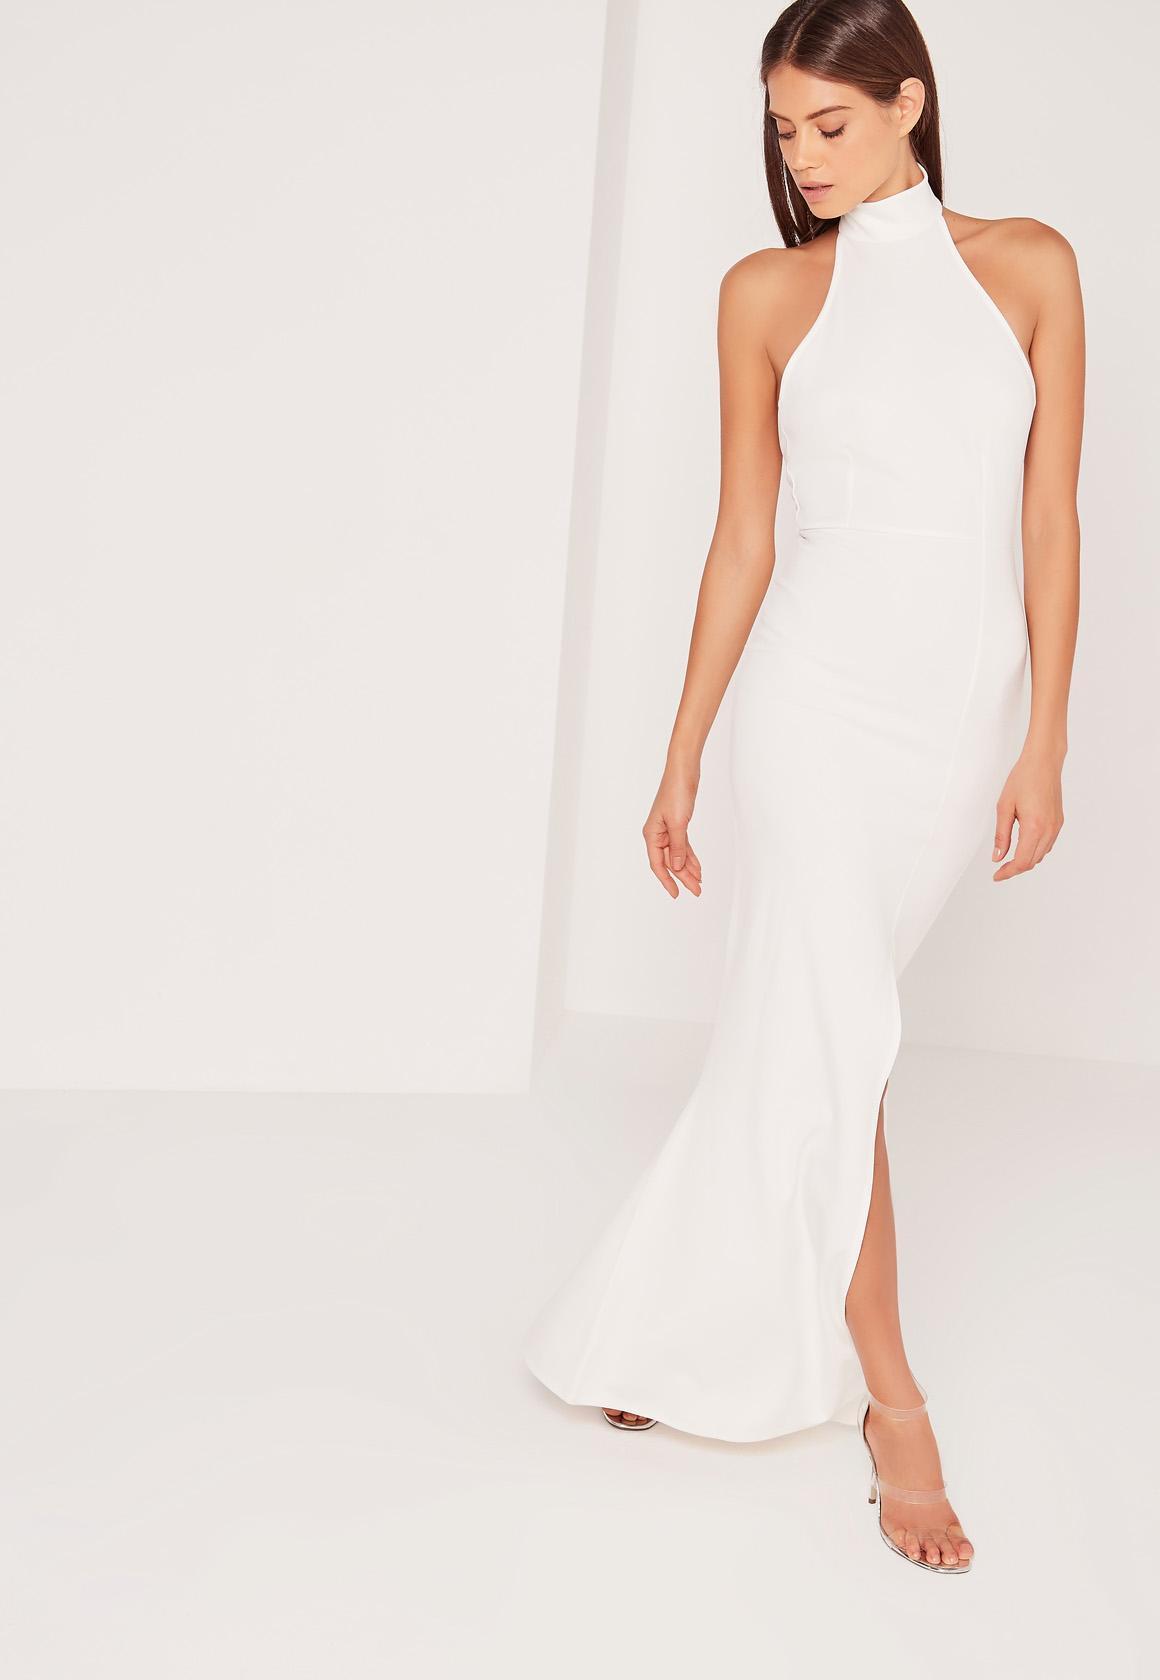 Missguided Choker Maxi Dress White in White